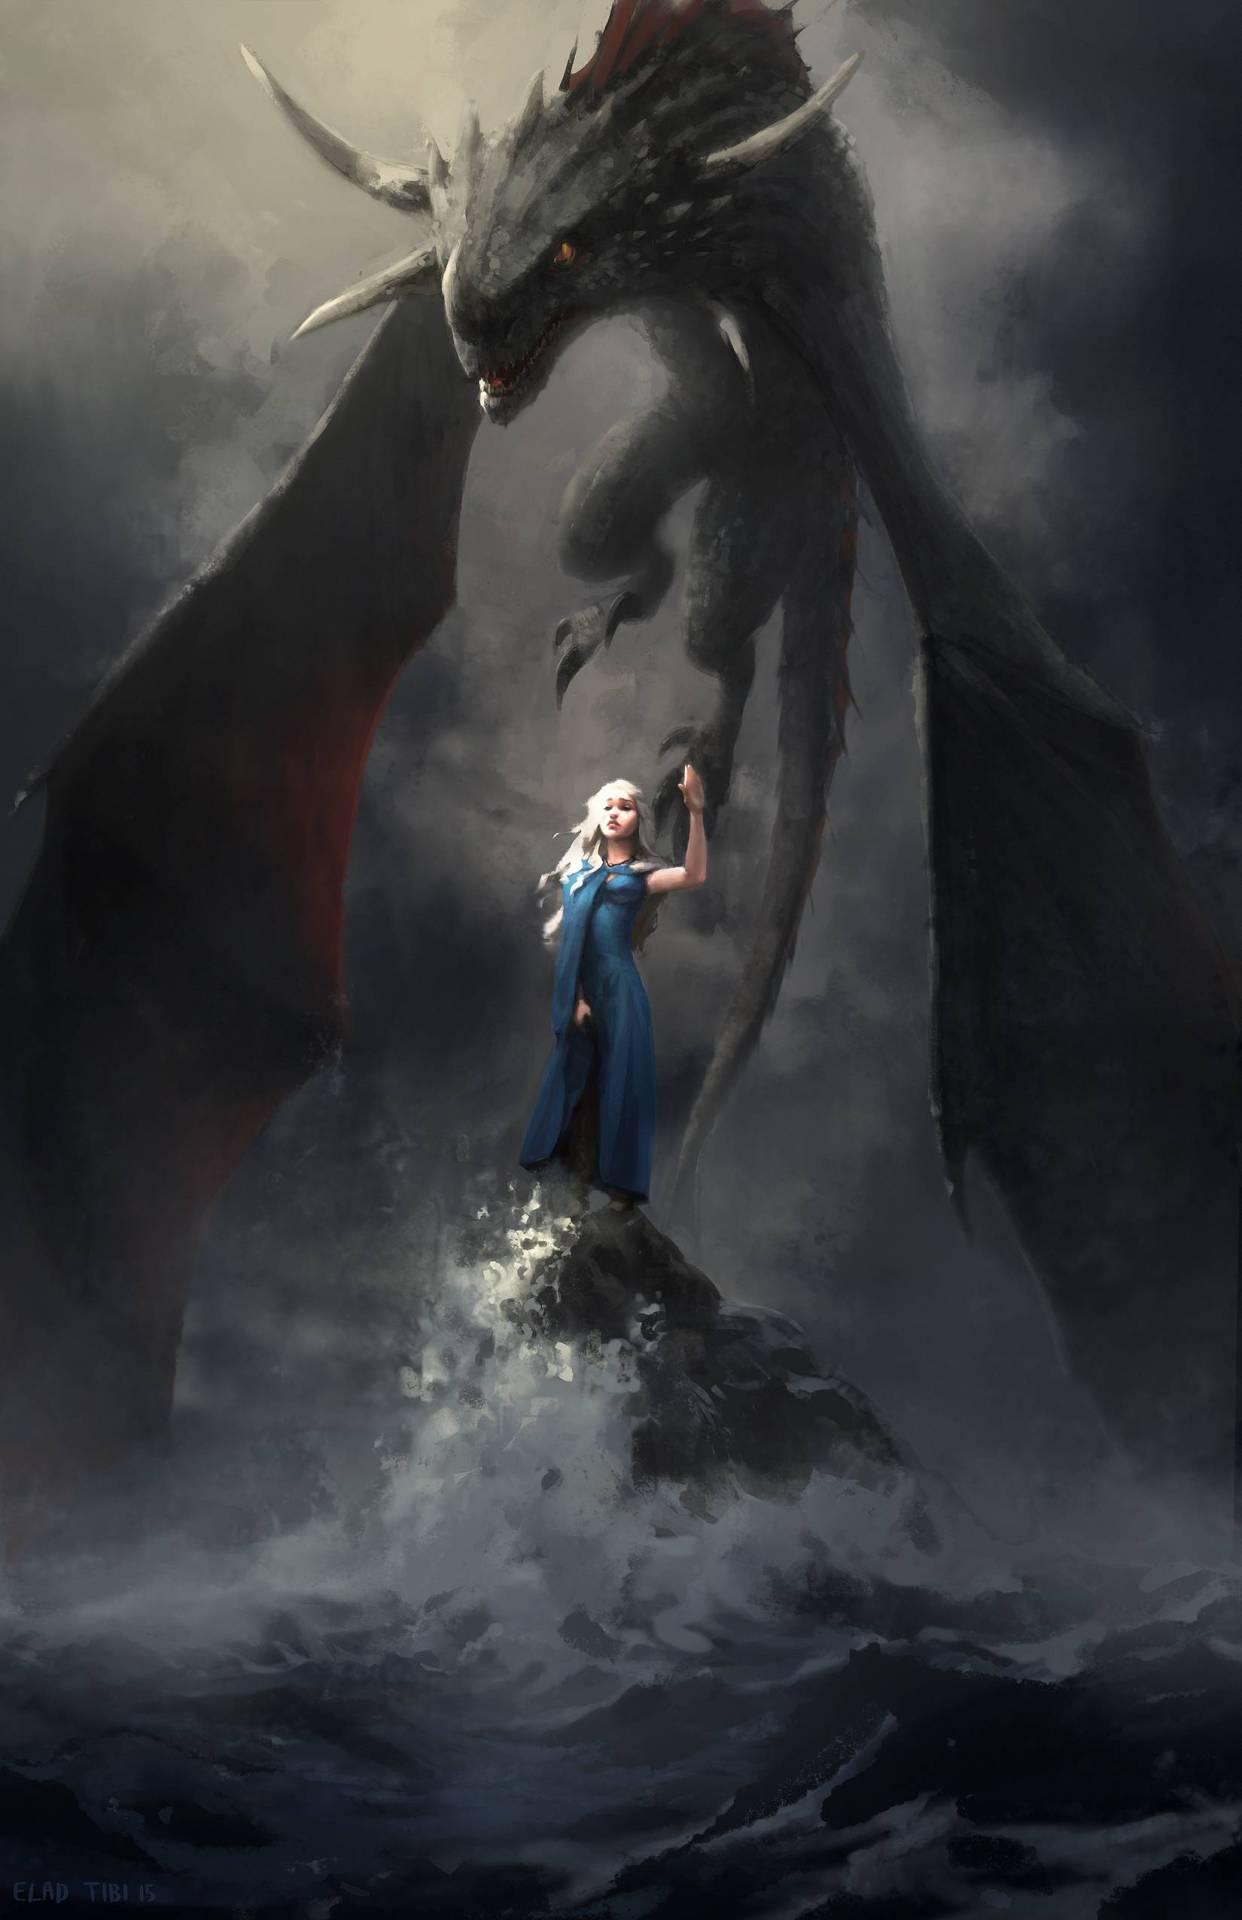 Badass Illustration of Daenerys and Drogon by captainsunshines